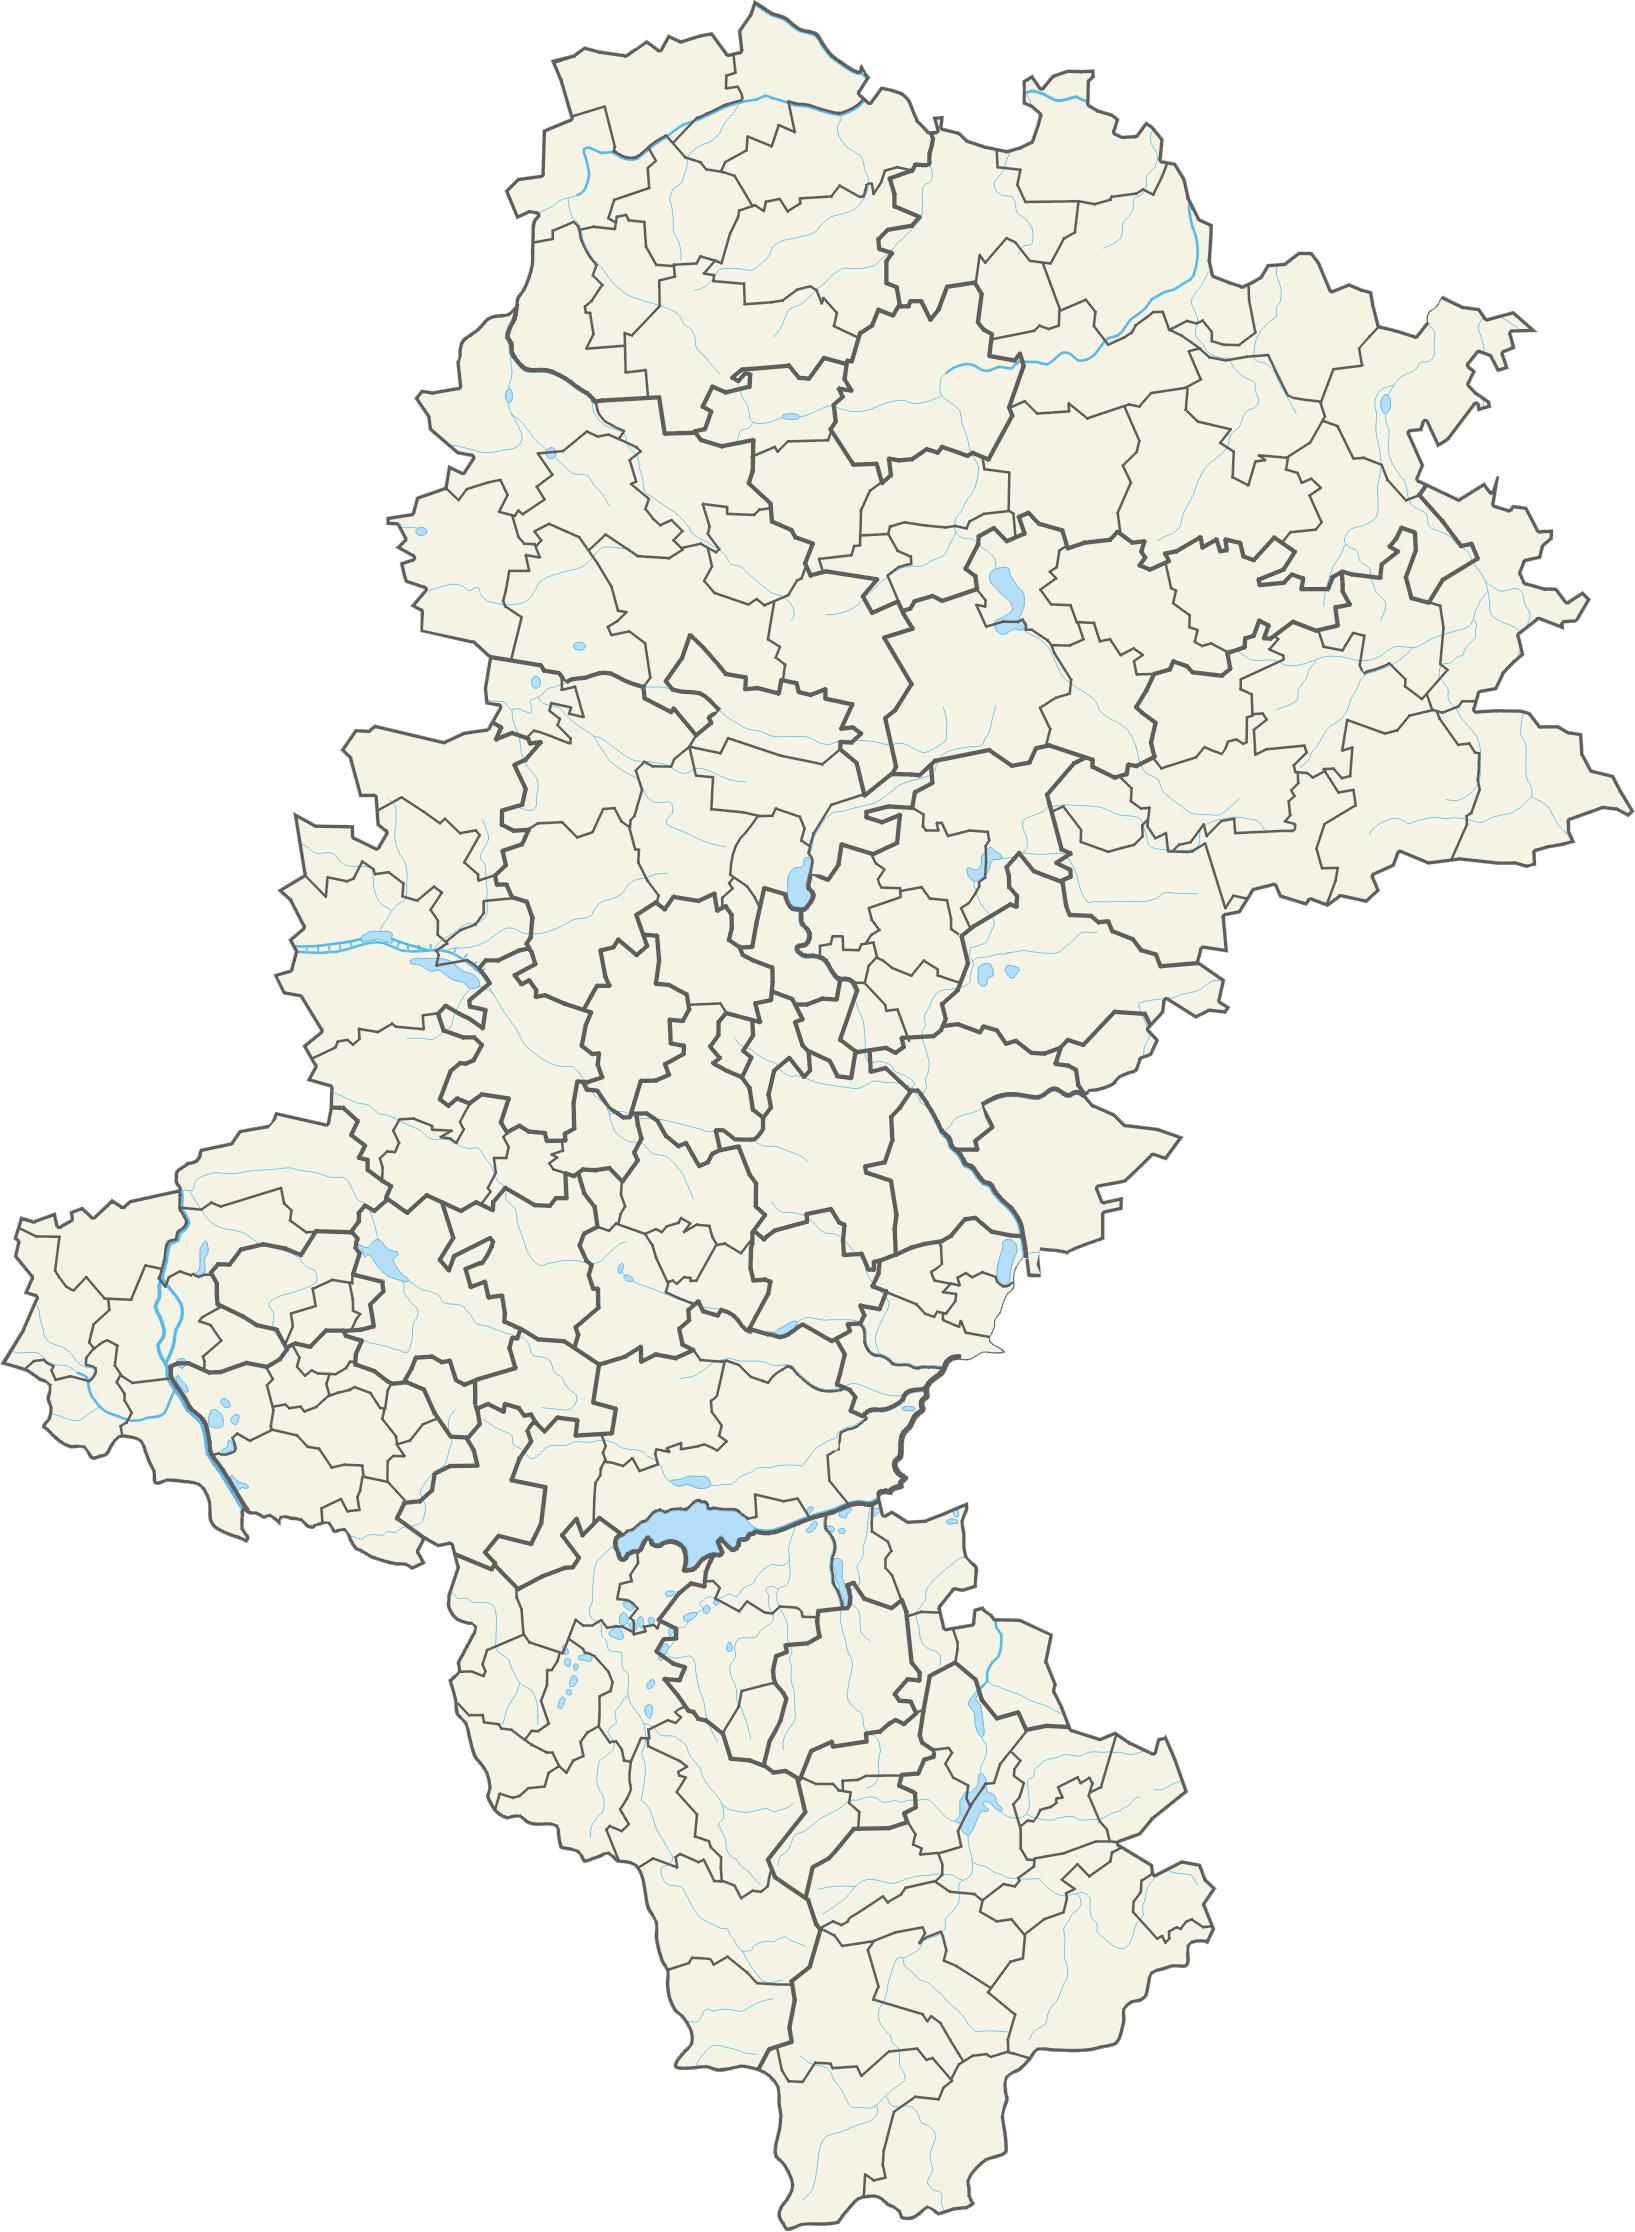 Файл:Slaskie mapa administracyjna.png